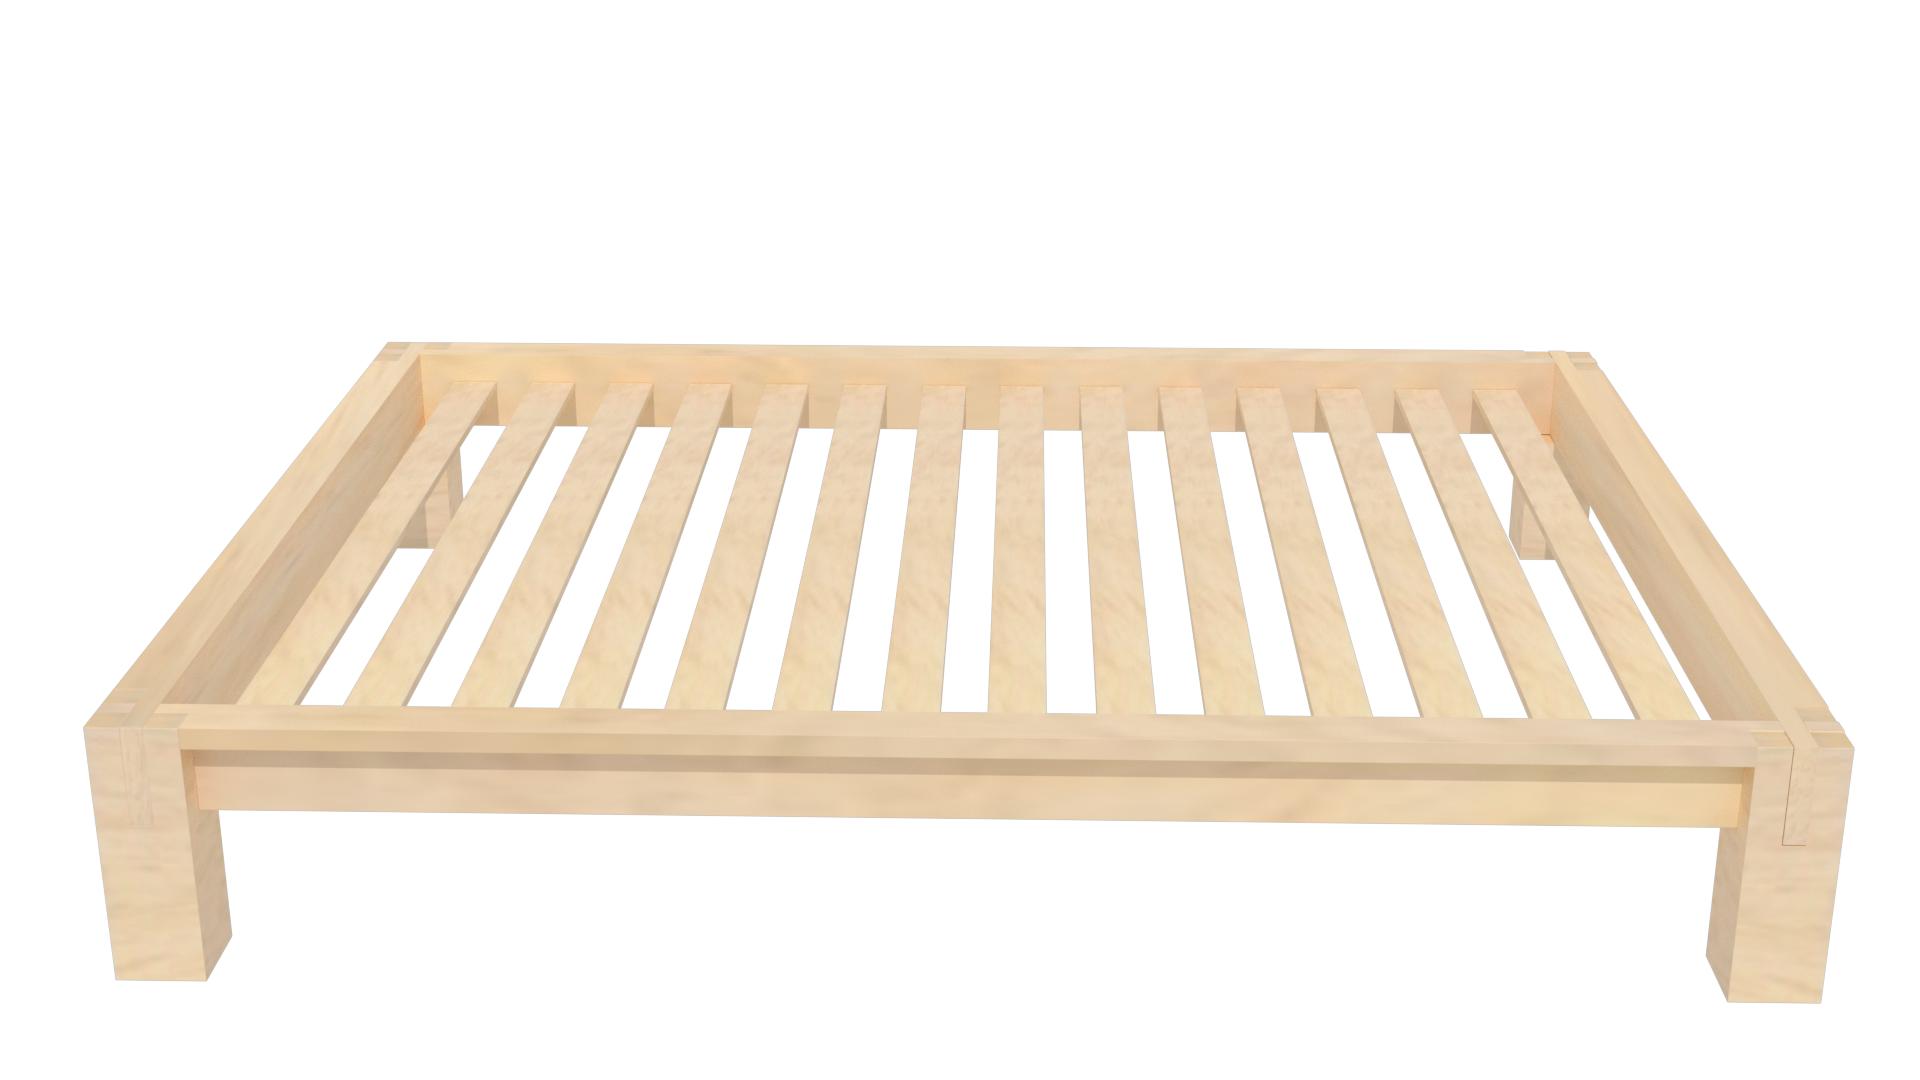 Raku Tatami High Rise Platform Bed in Natural